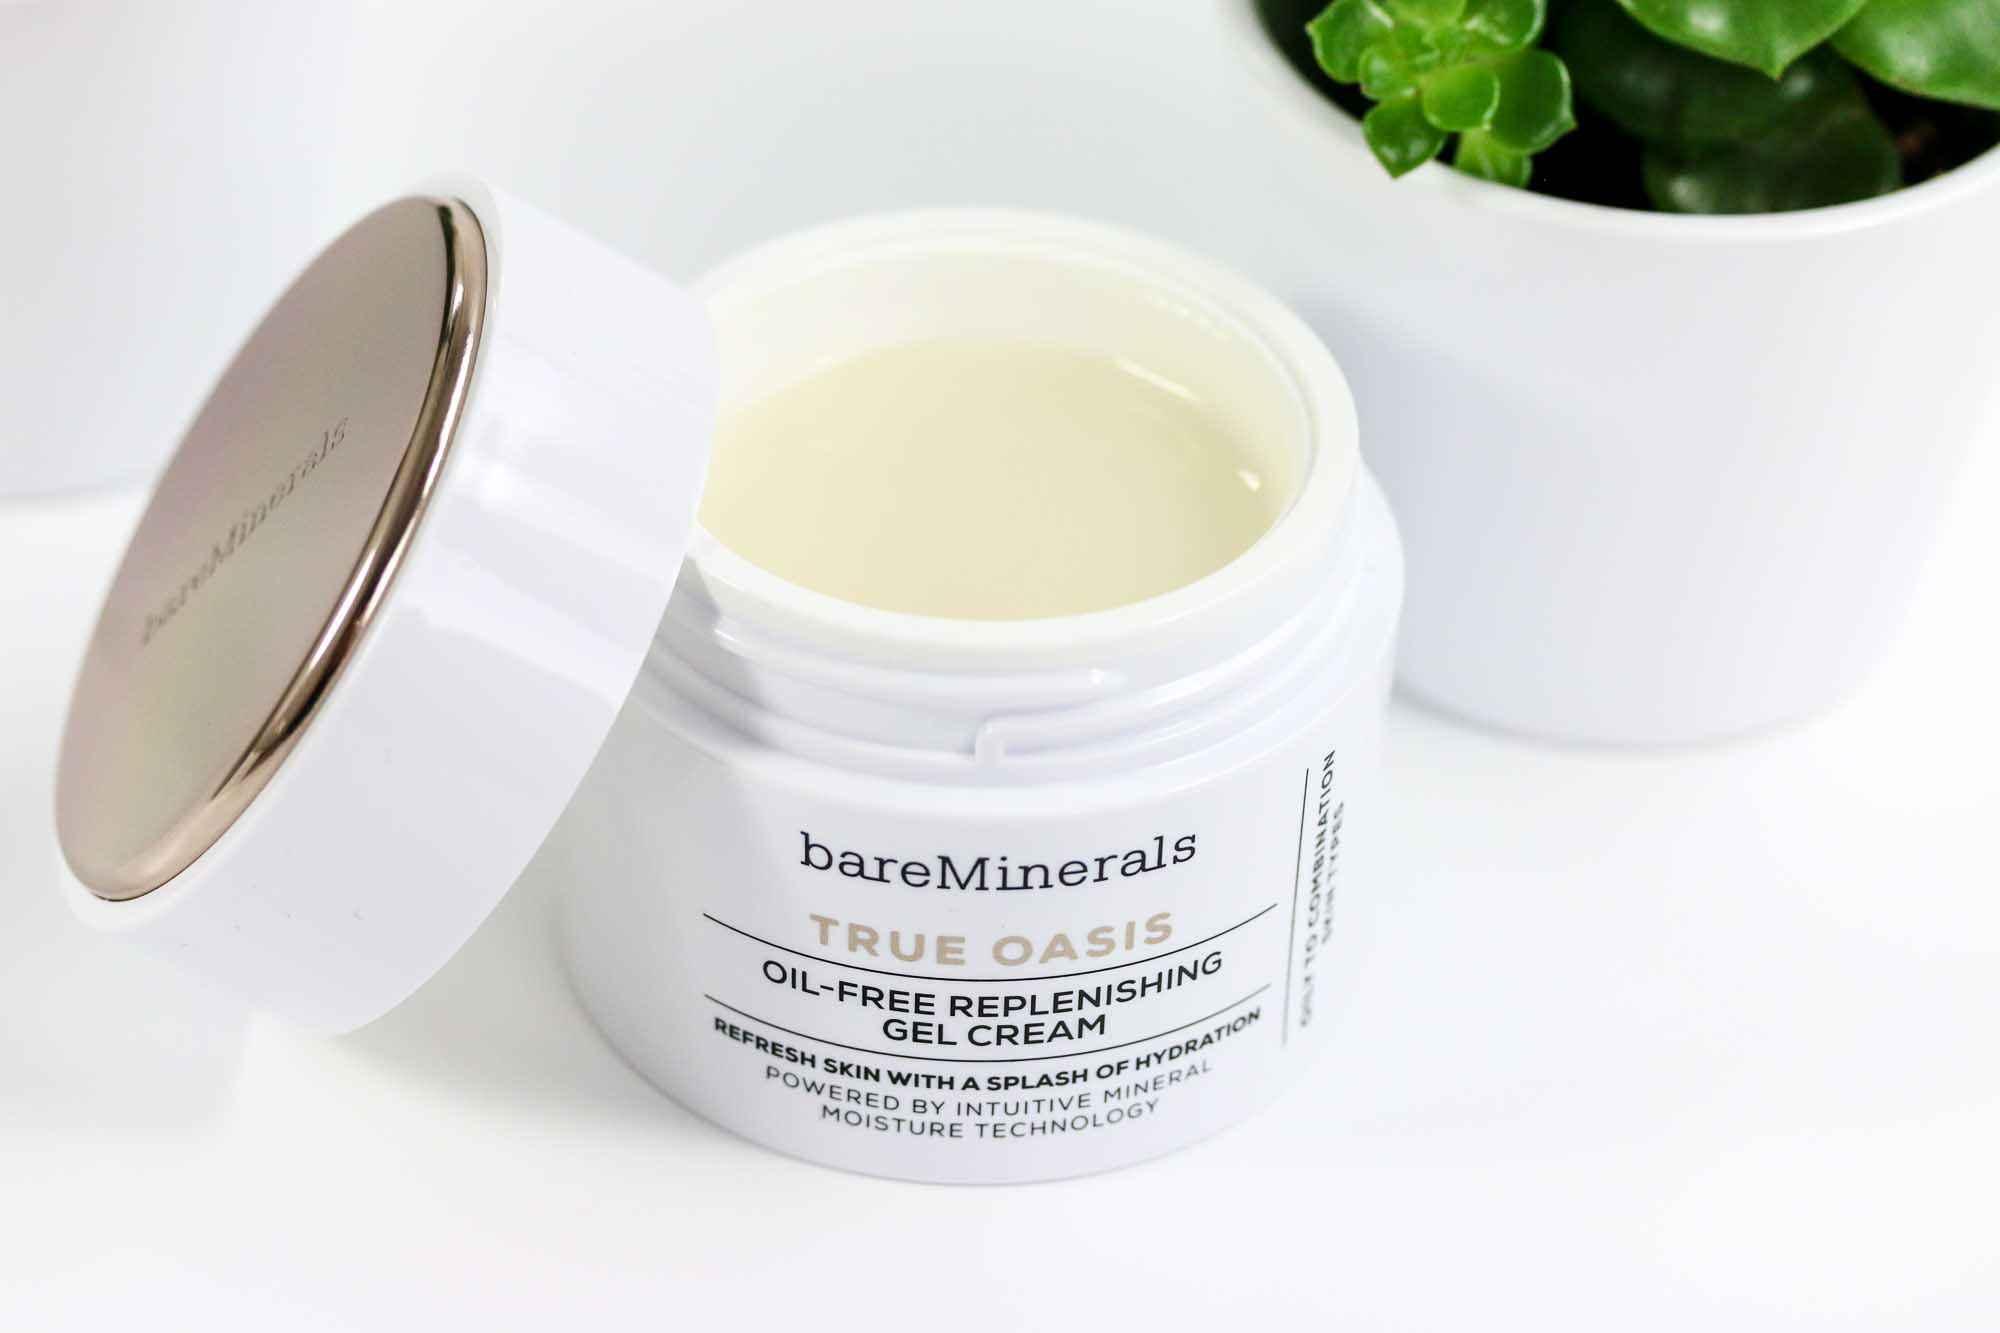 bareMinerals Hautpflege-23